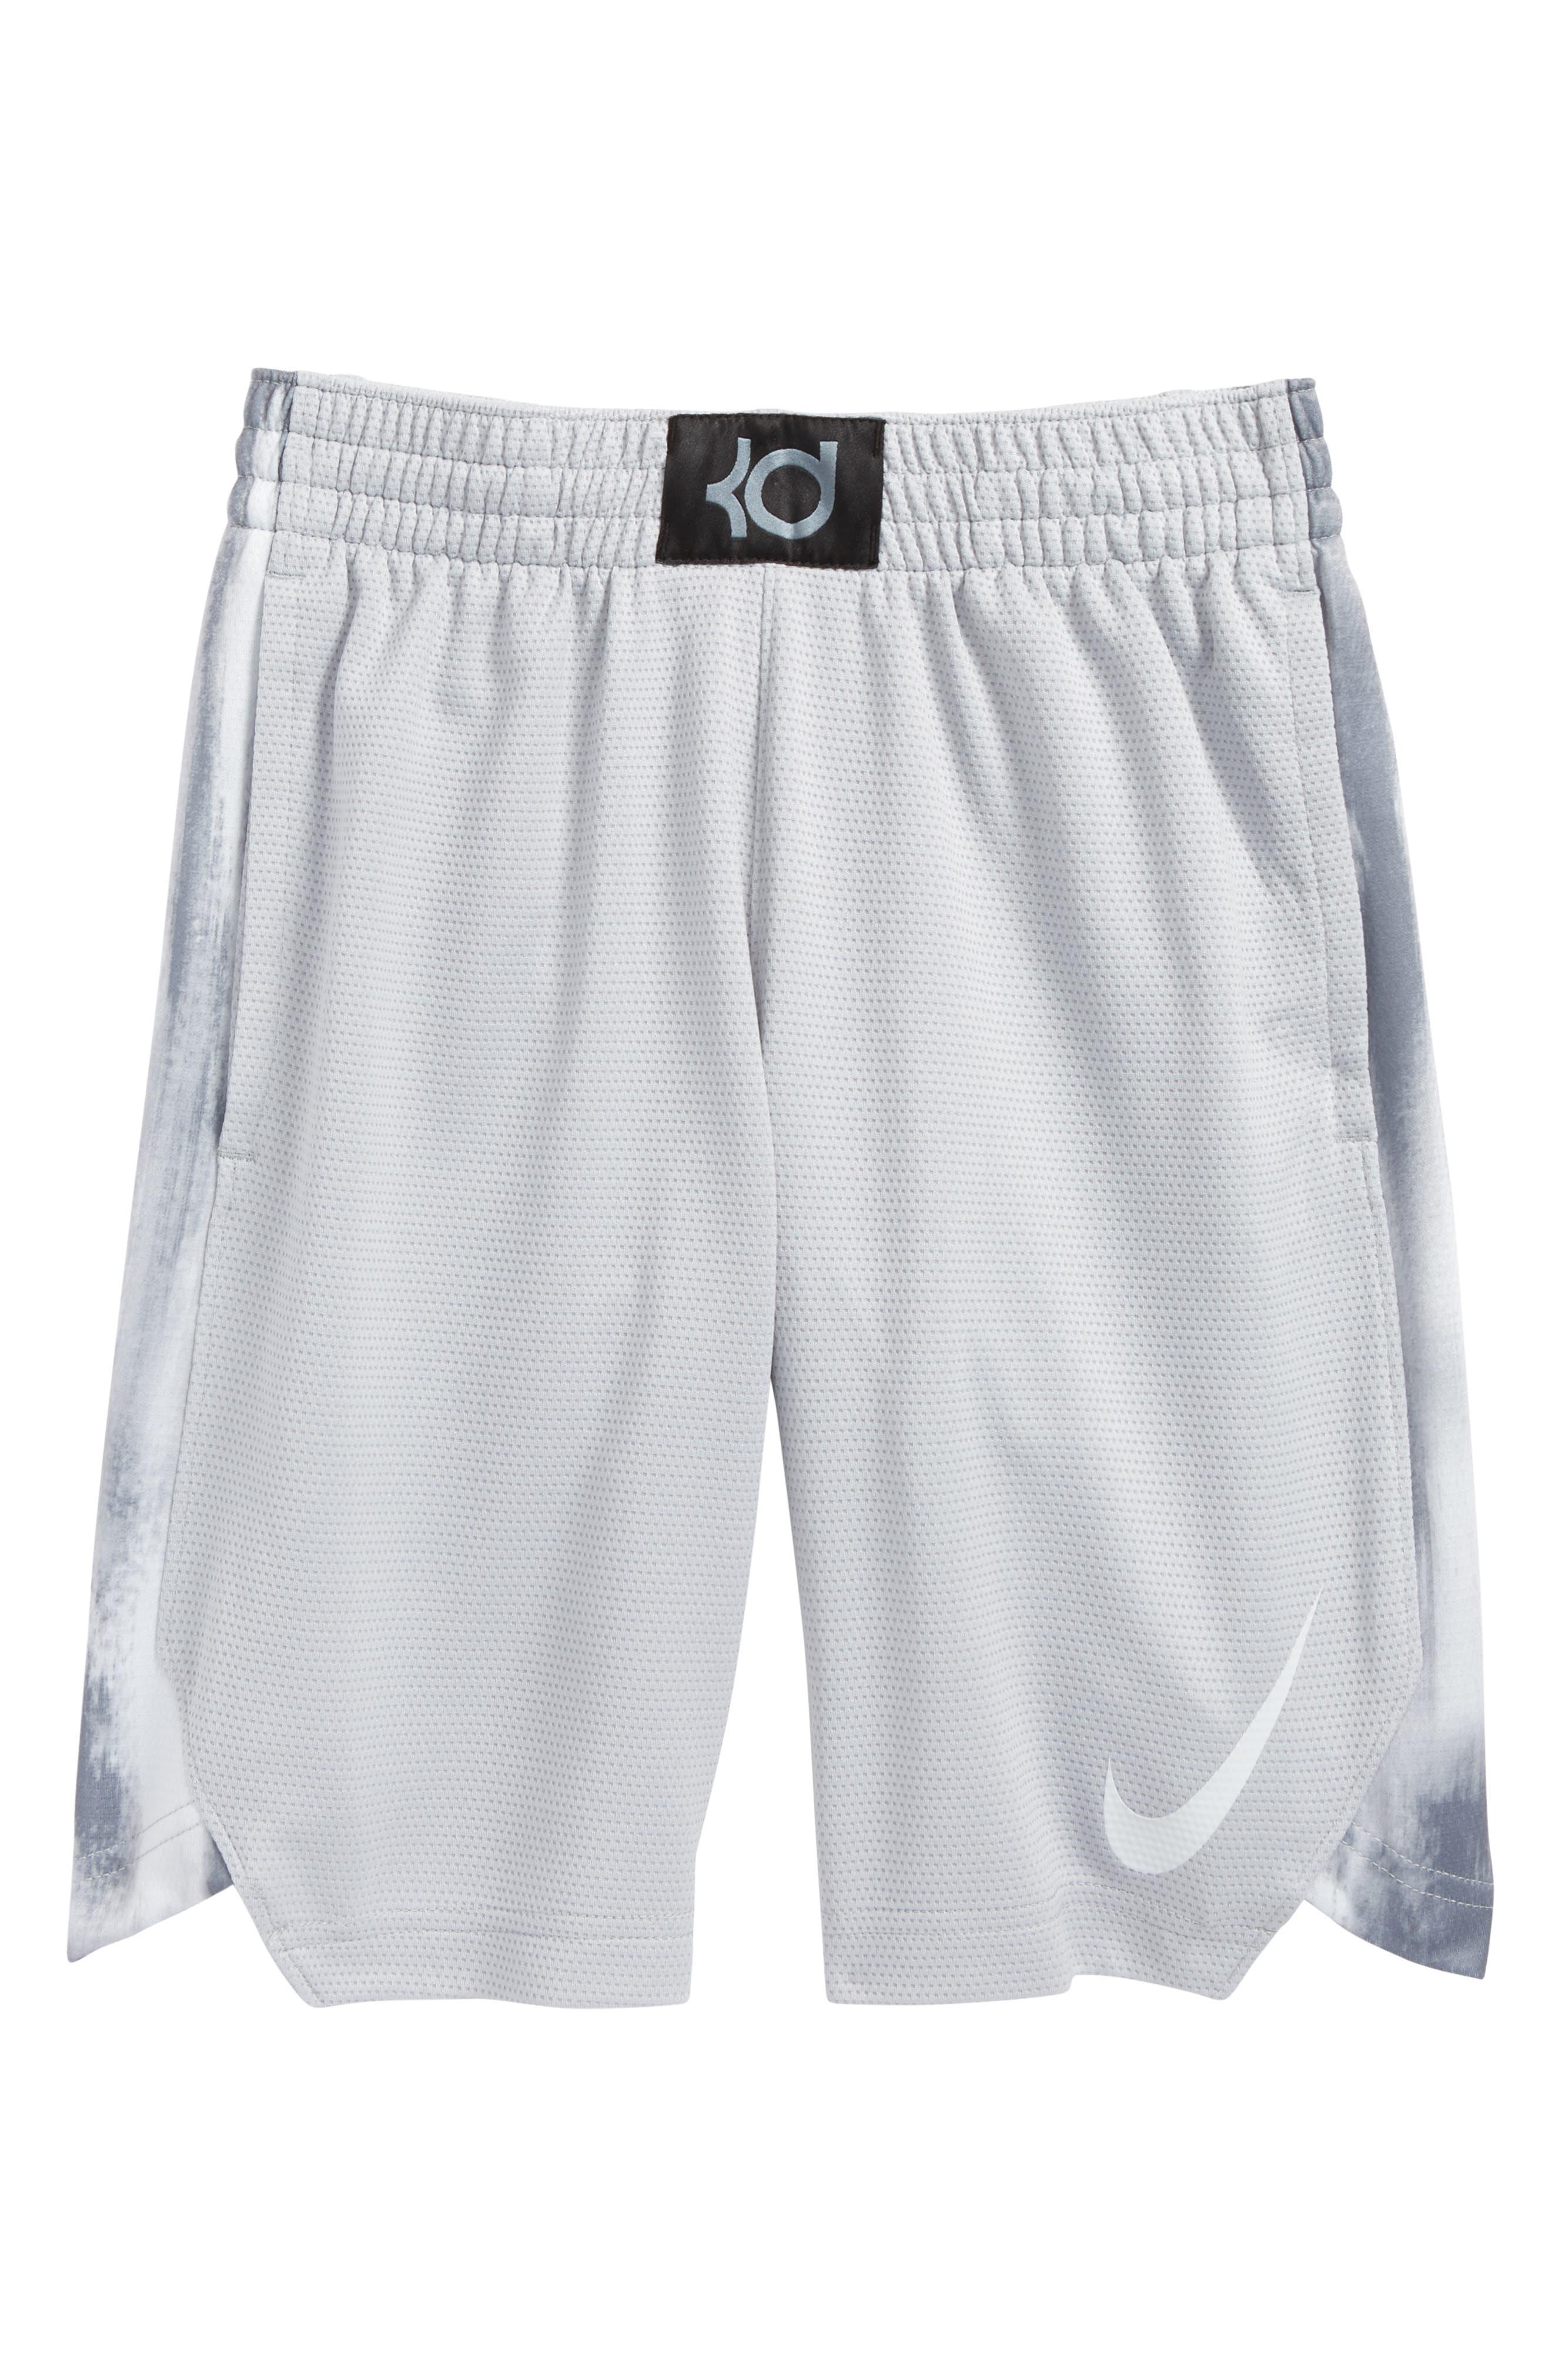 Kevin Durant Elite Shorts,                             Main thumbnail 2, color,